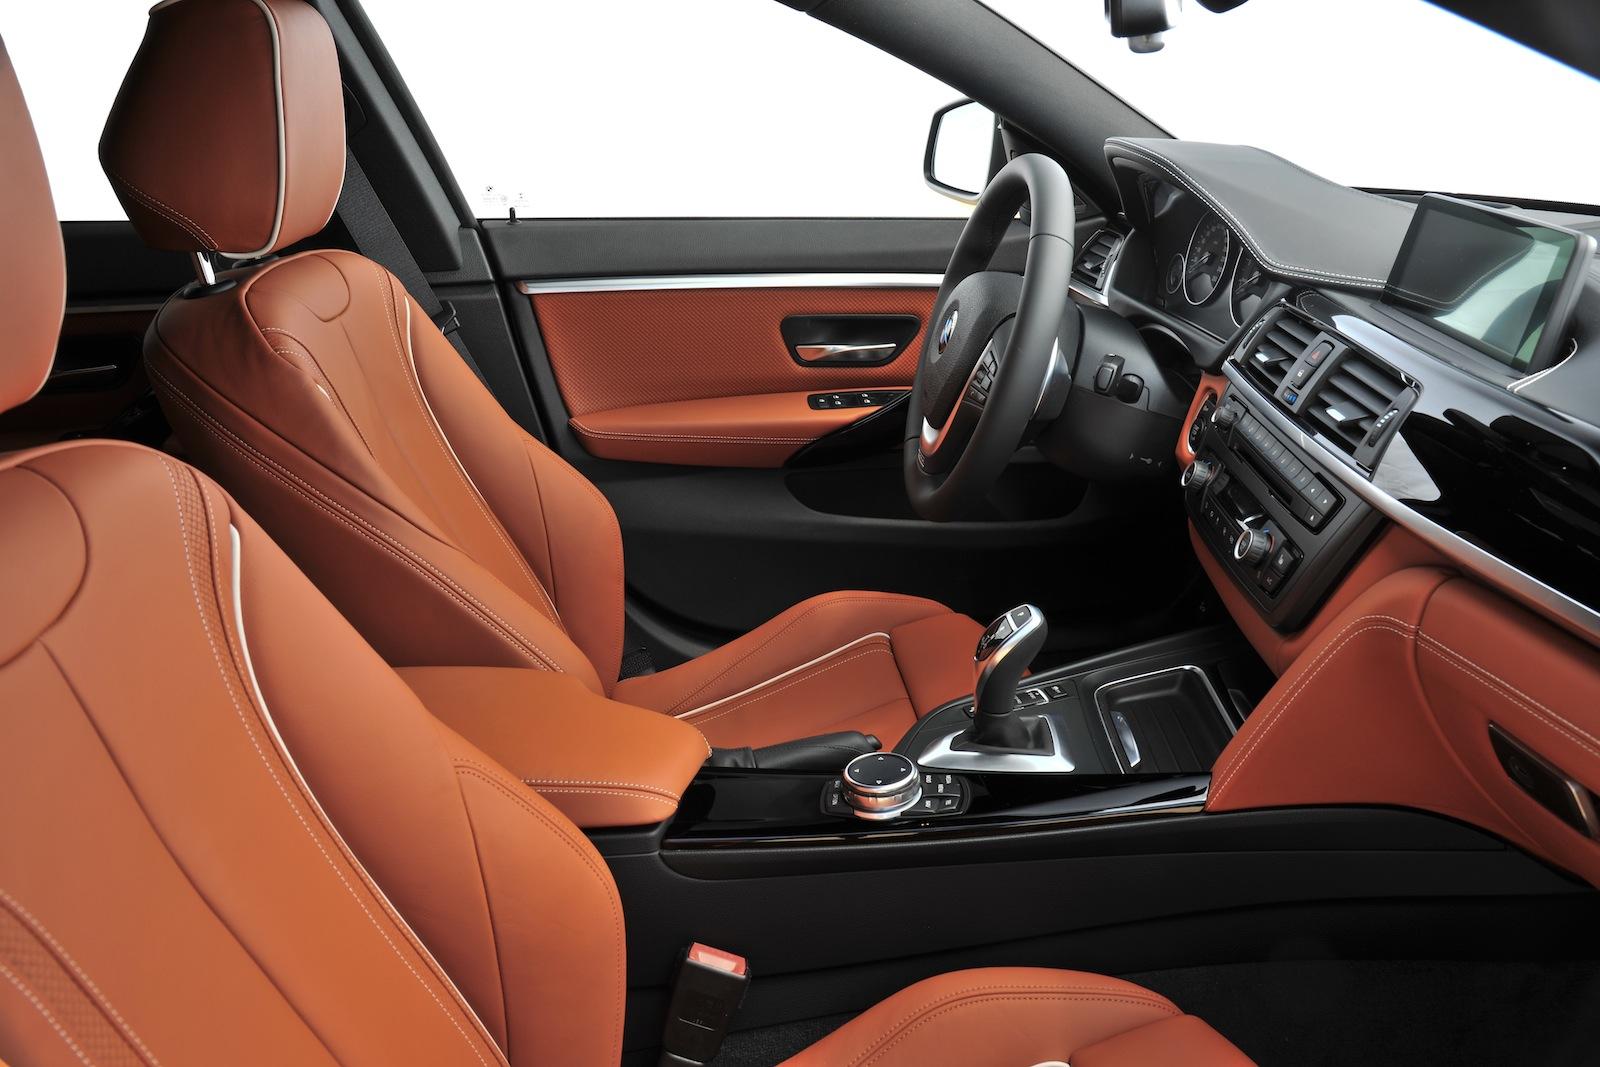 Interior 1995 Wagon Accord Leather